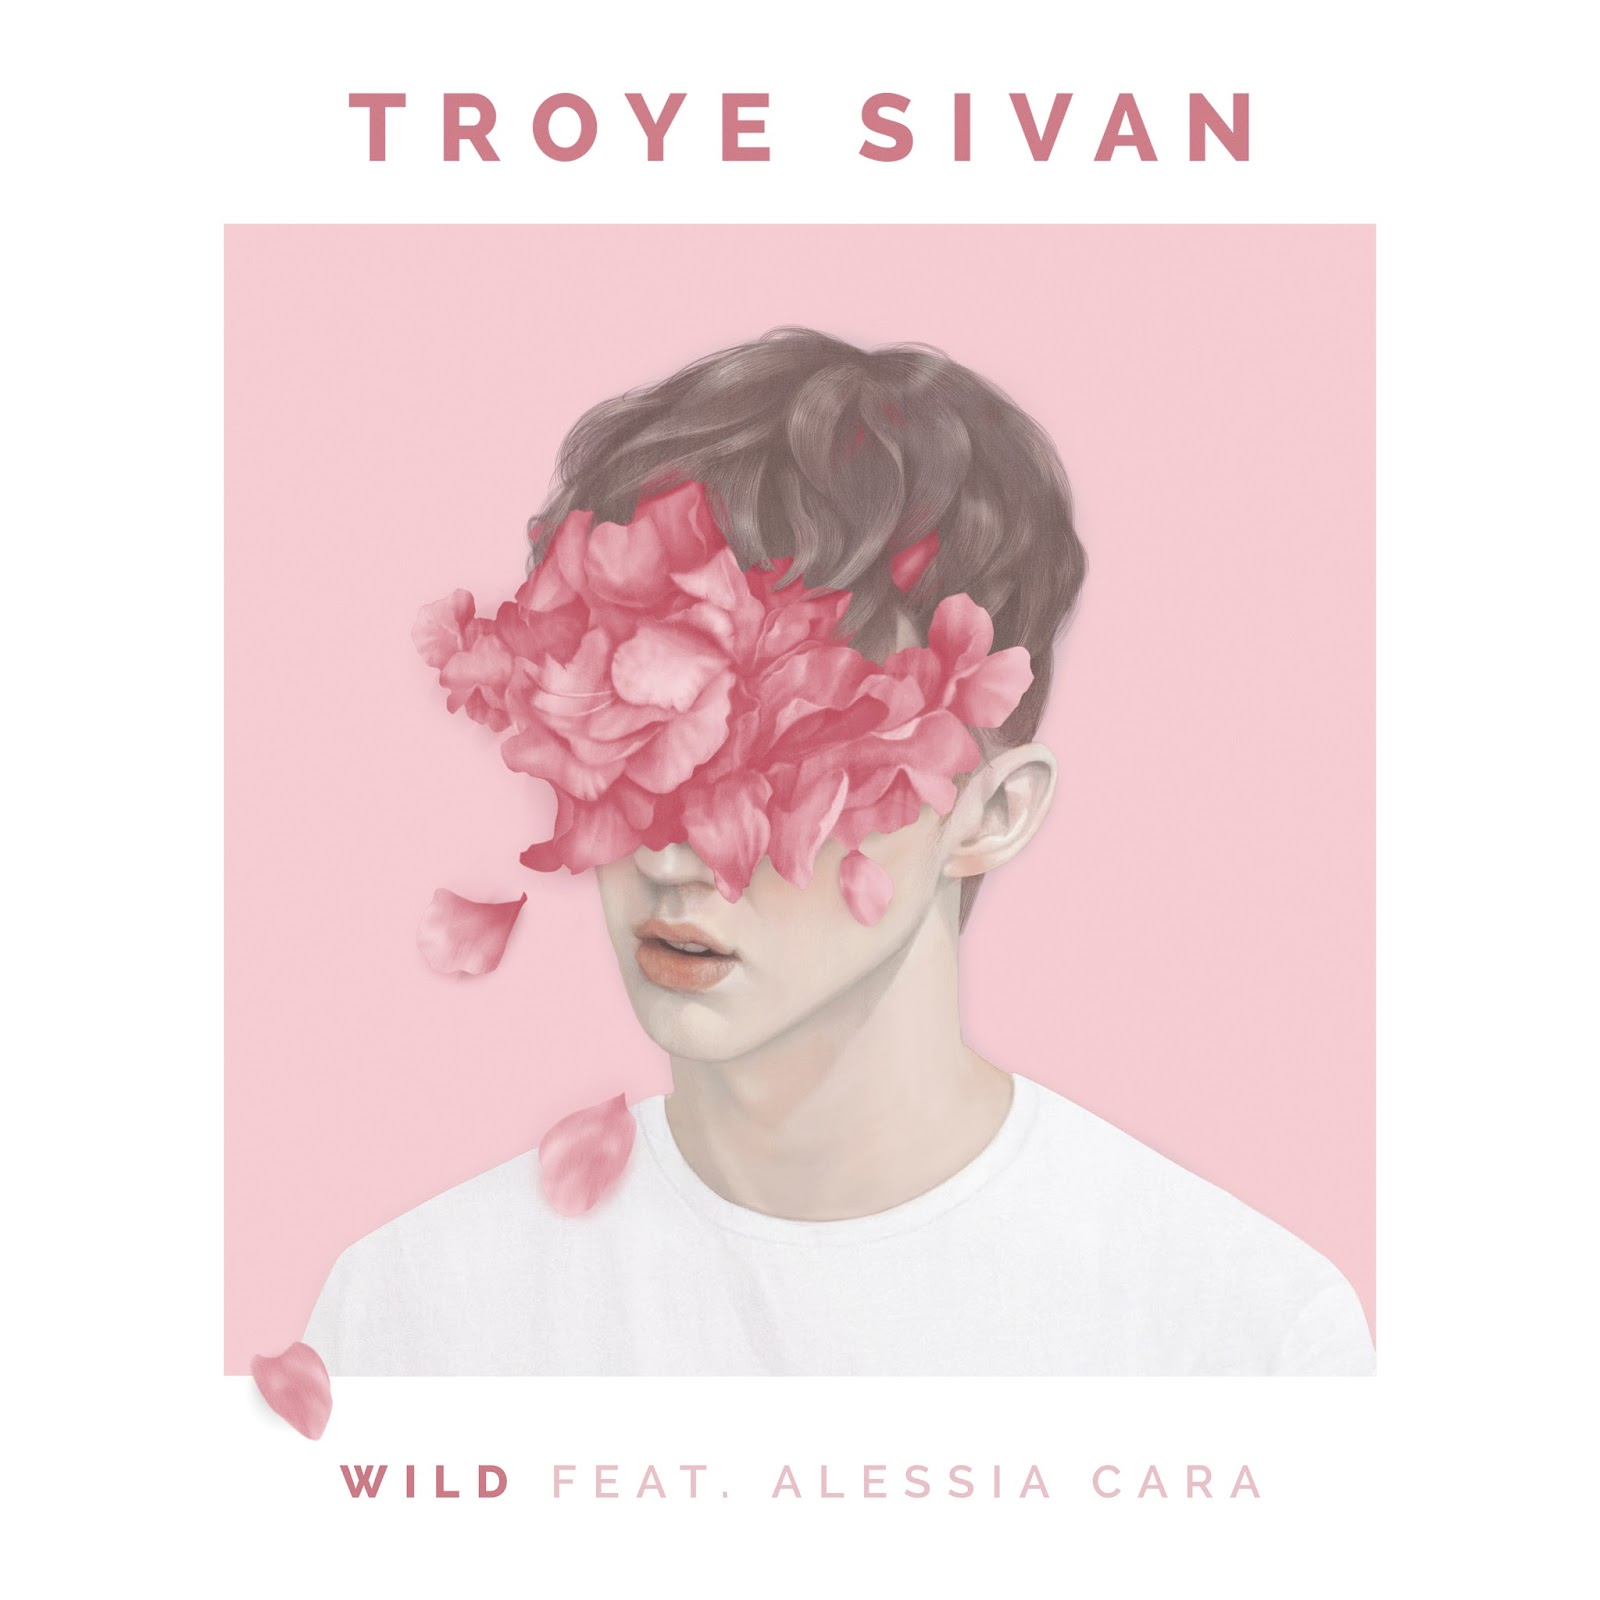 Troye Sivan - WILD (feat. Alessia Cara) - Single  Cover